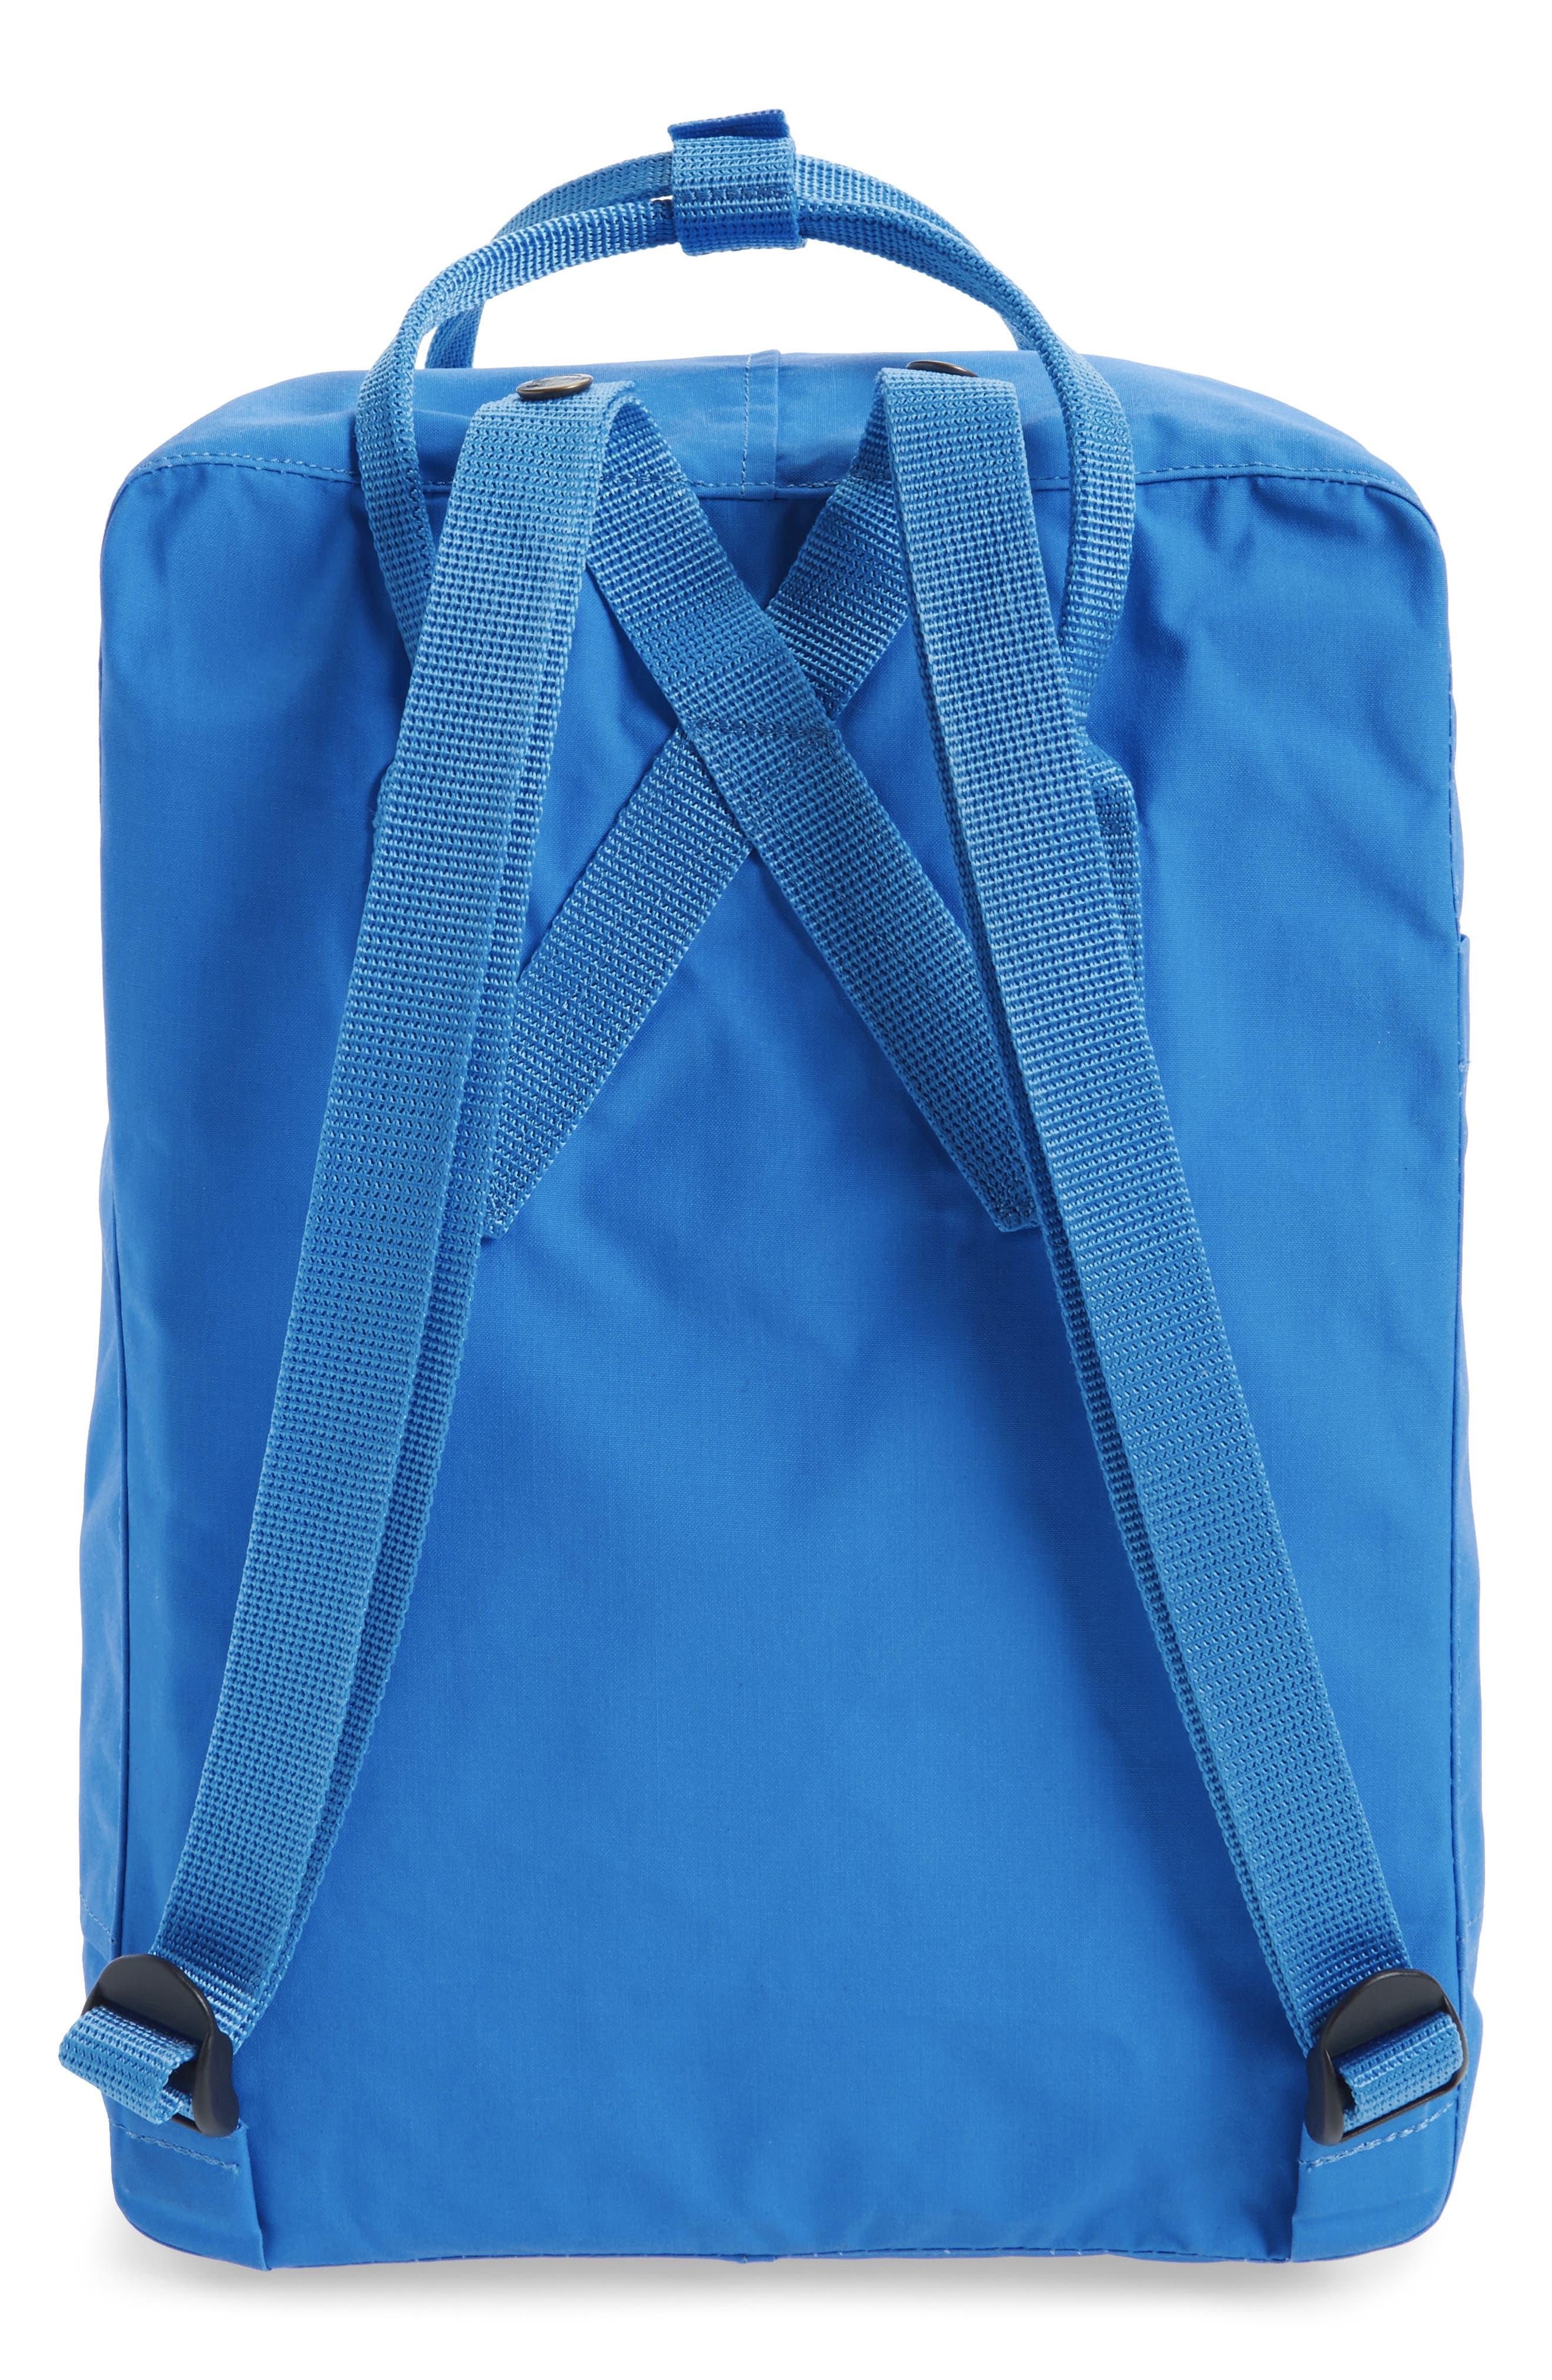 Alternate Image 3  - Fjällräven 'Kånken' Water Resistant Backpack